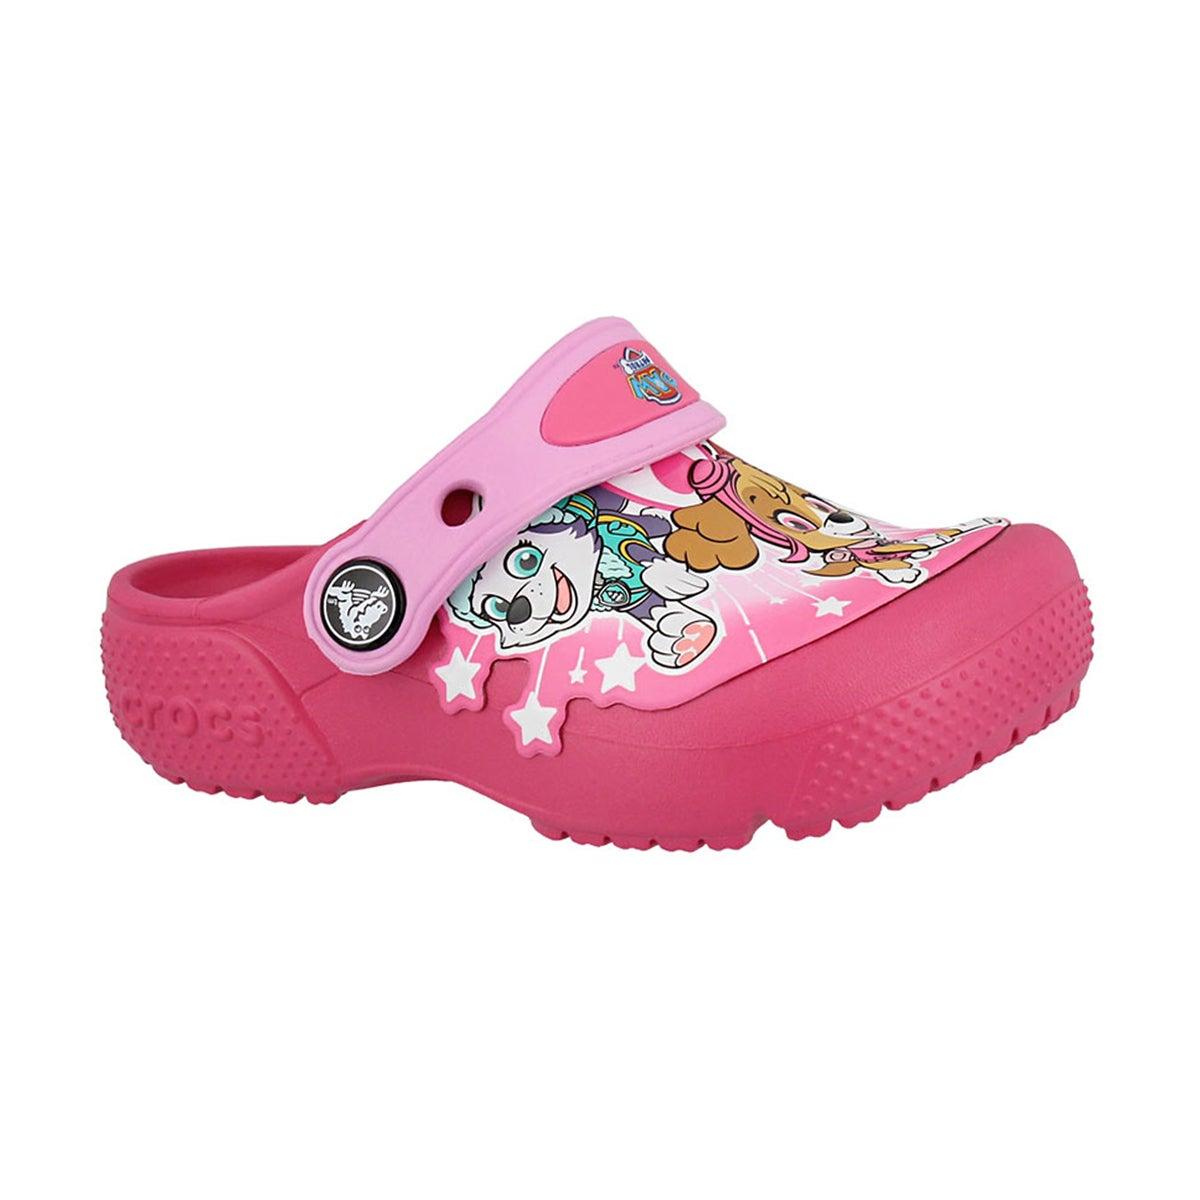 Girls' FUNLAB PAW PATROL vibrant pink clogs